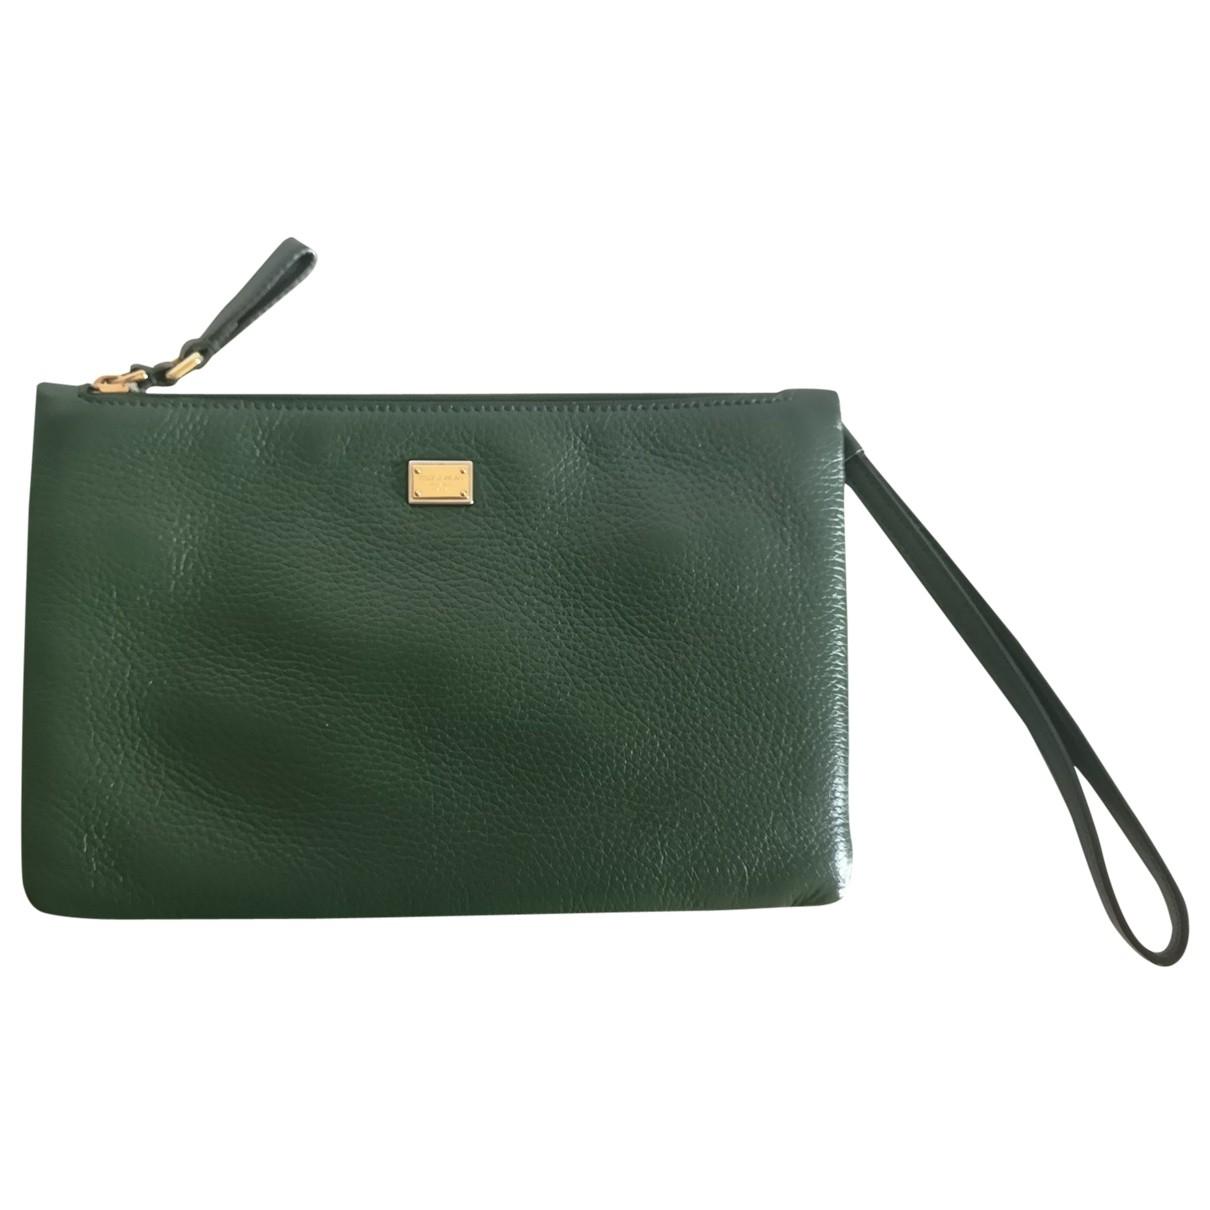 Dolce & Gabbana \N Green Leather Clutch bag for Women \N